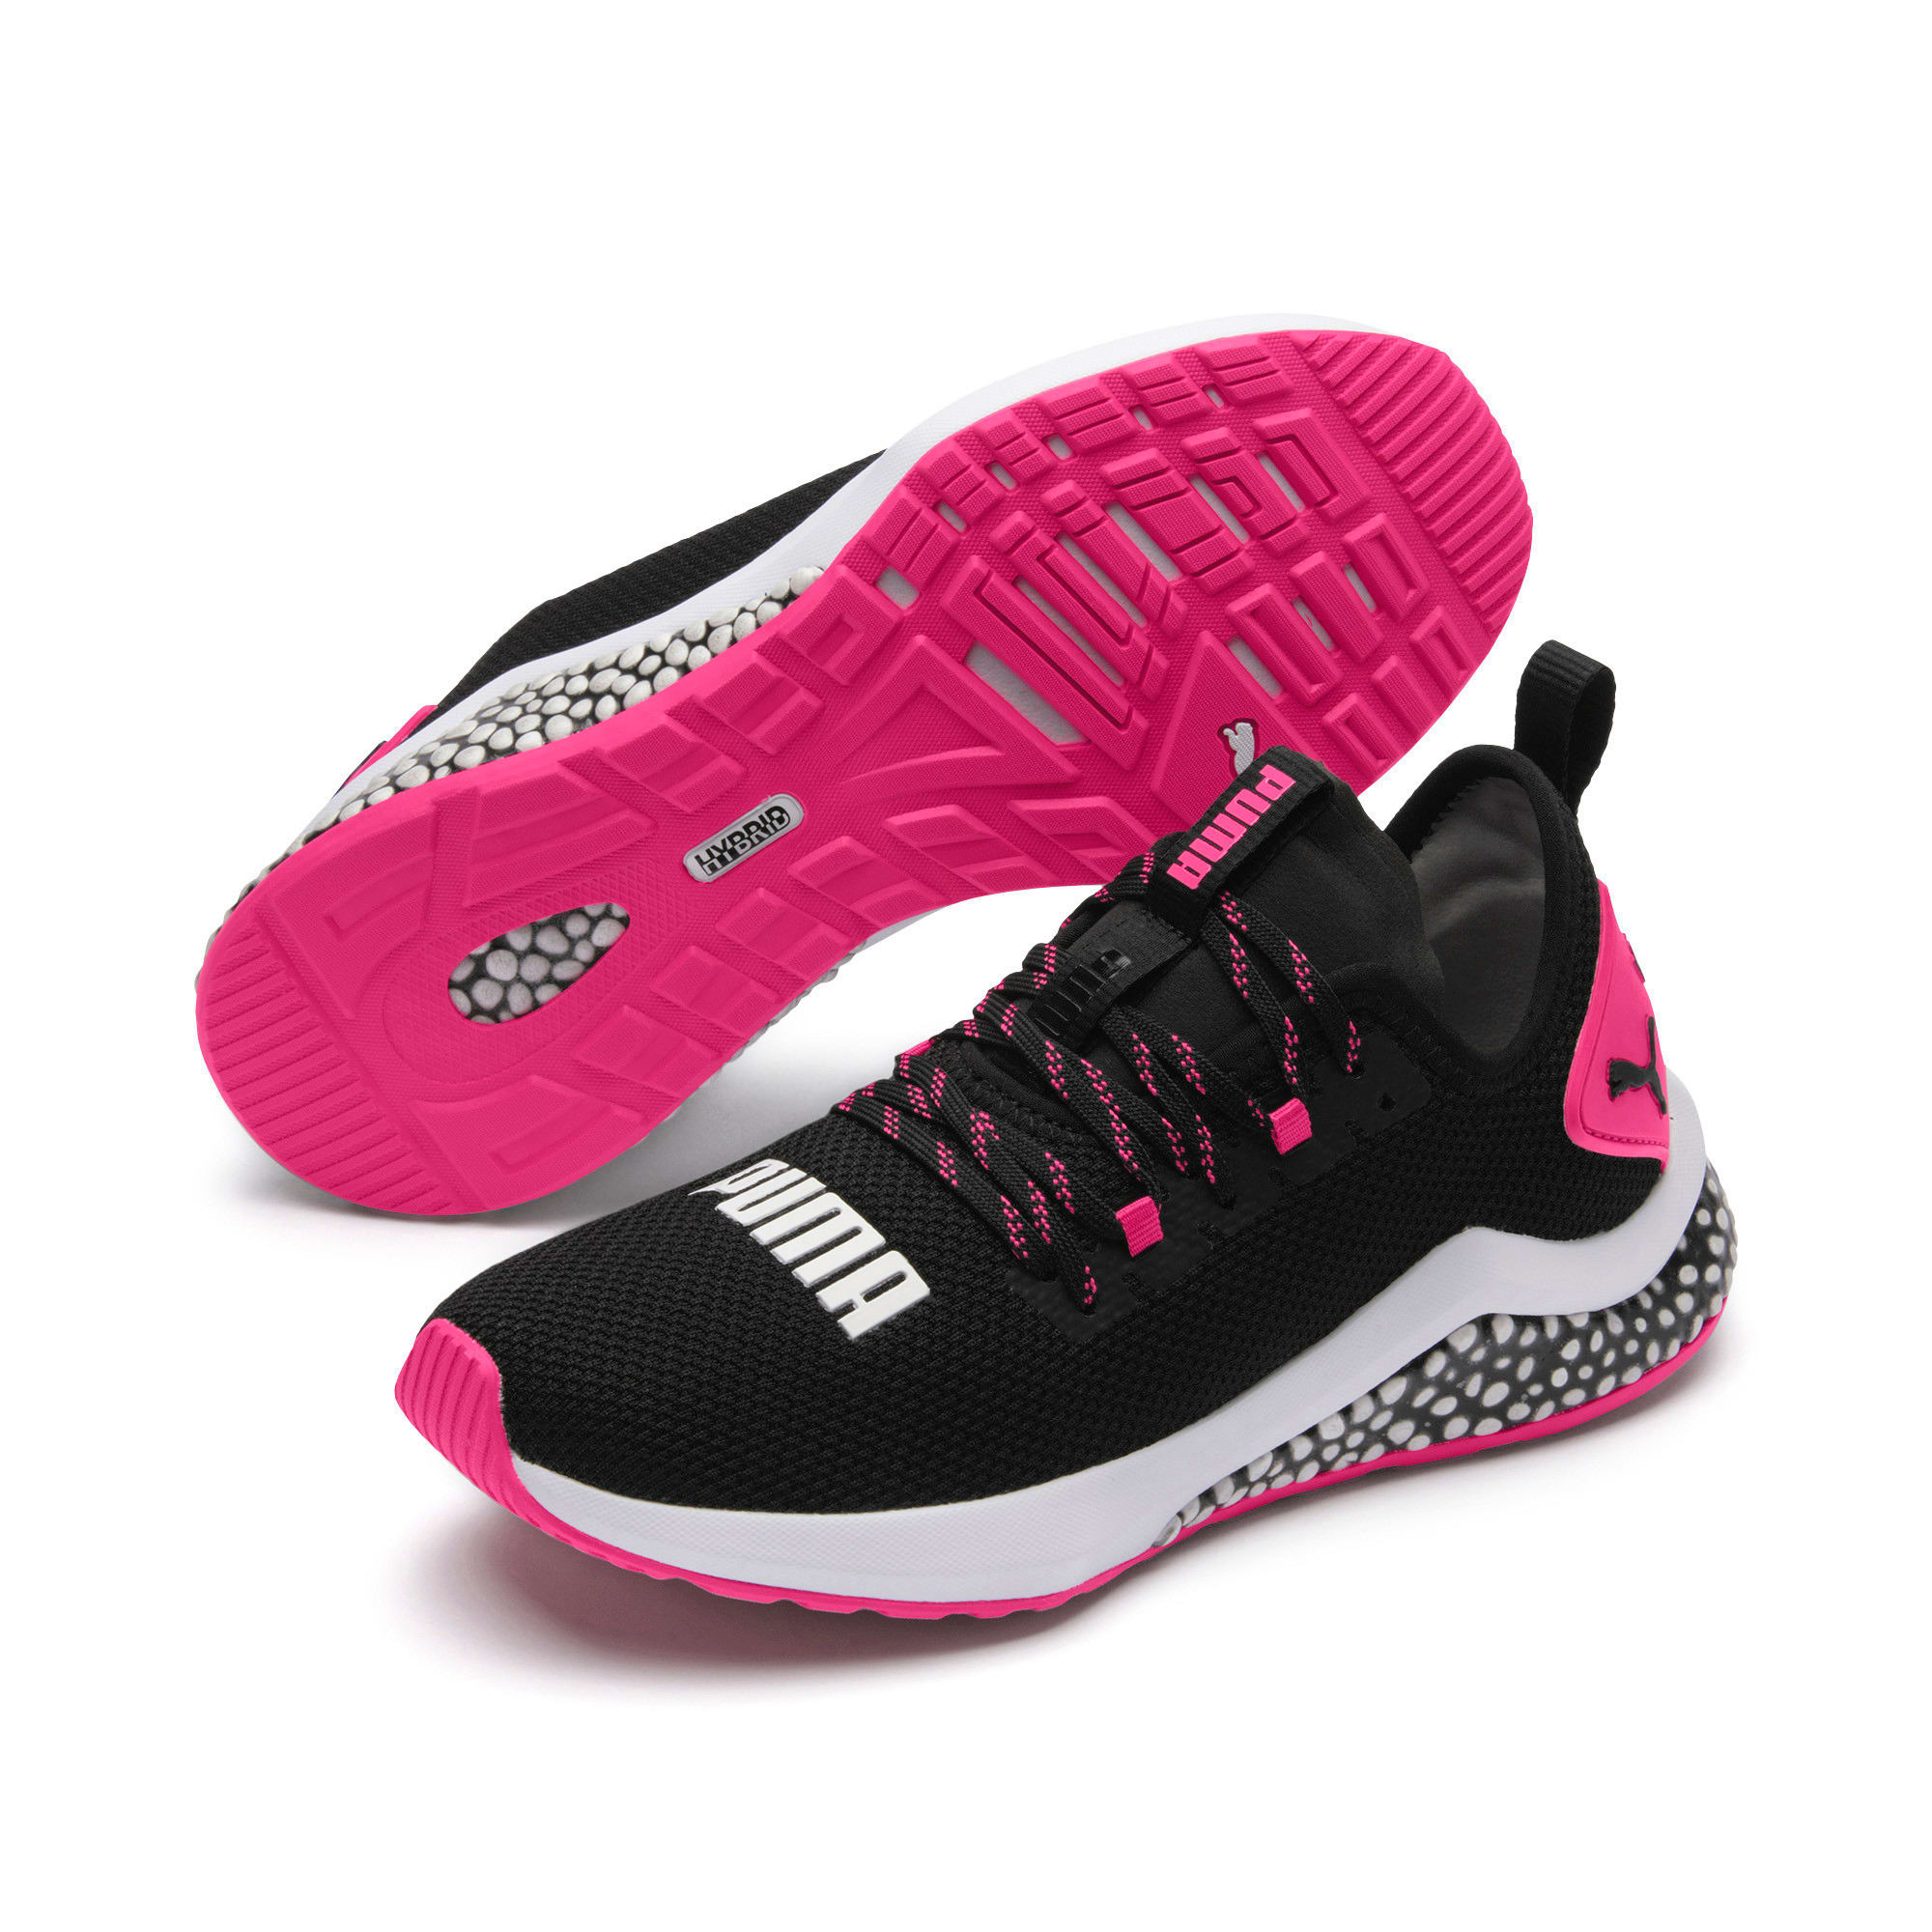 Thumbnail 3 of HYBRID NX Women's Running Shoes, Puma Black-Fuchsia Purple, medium